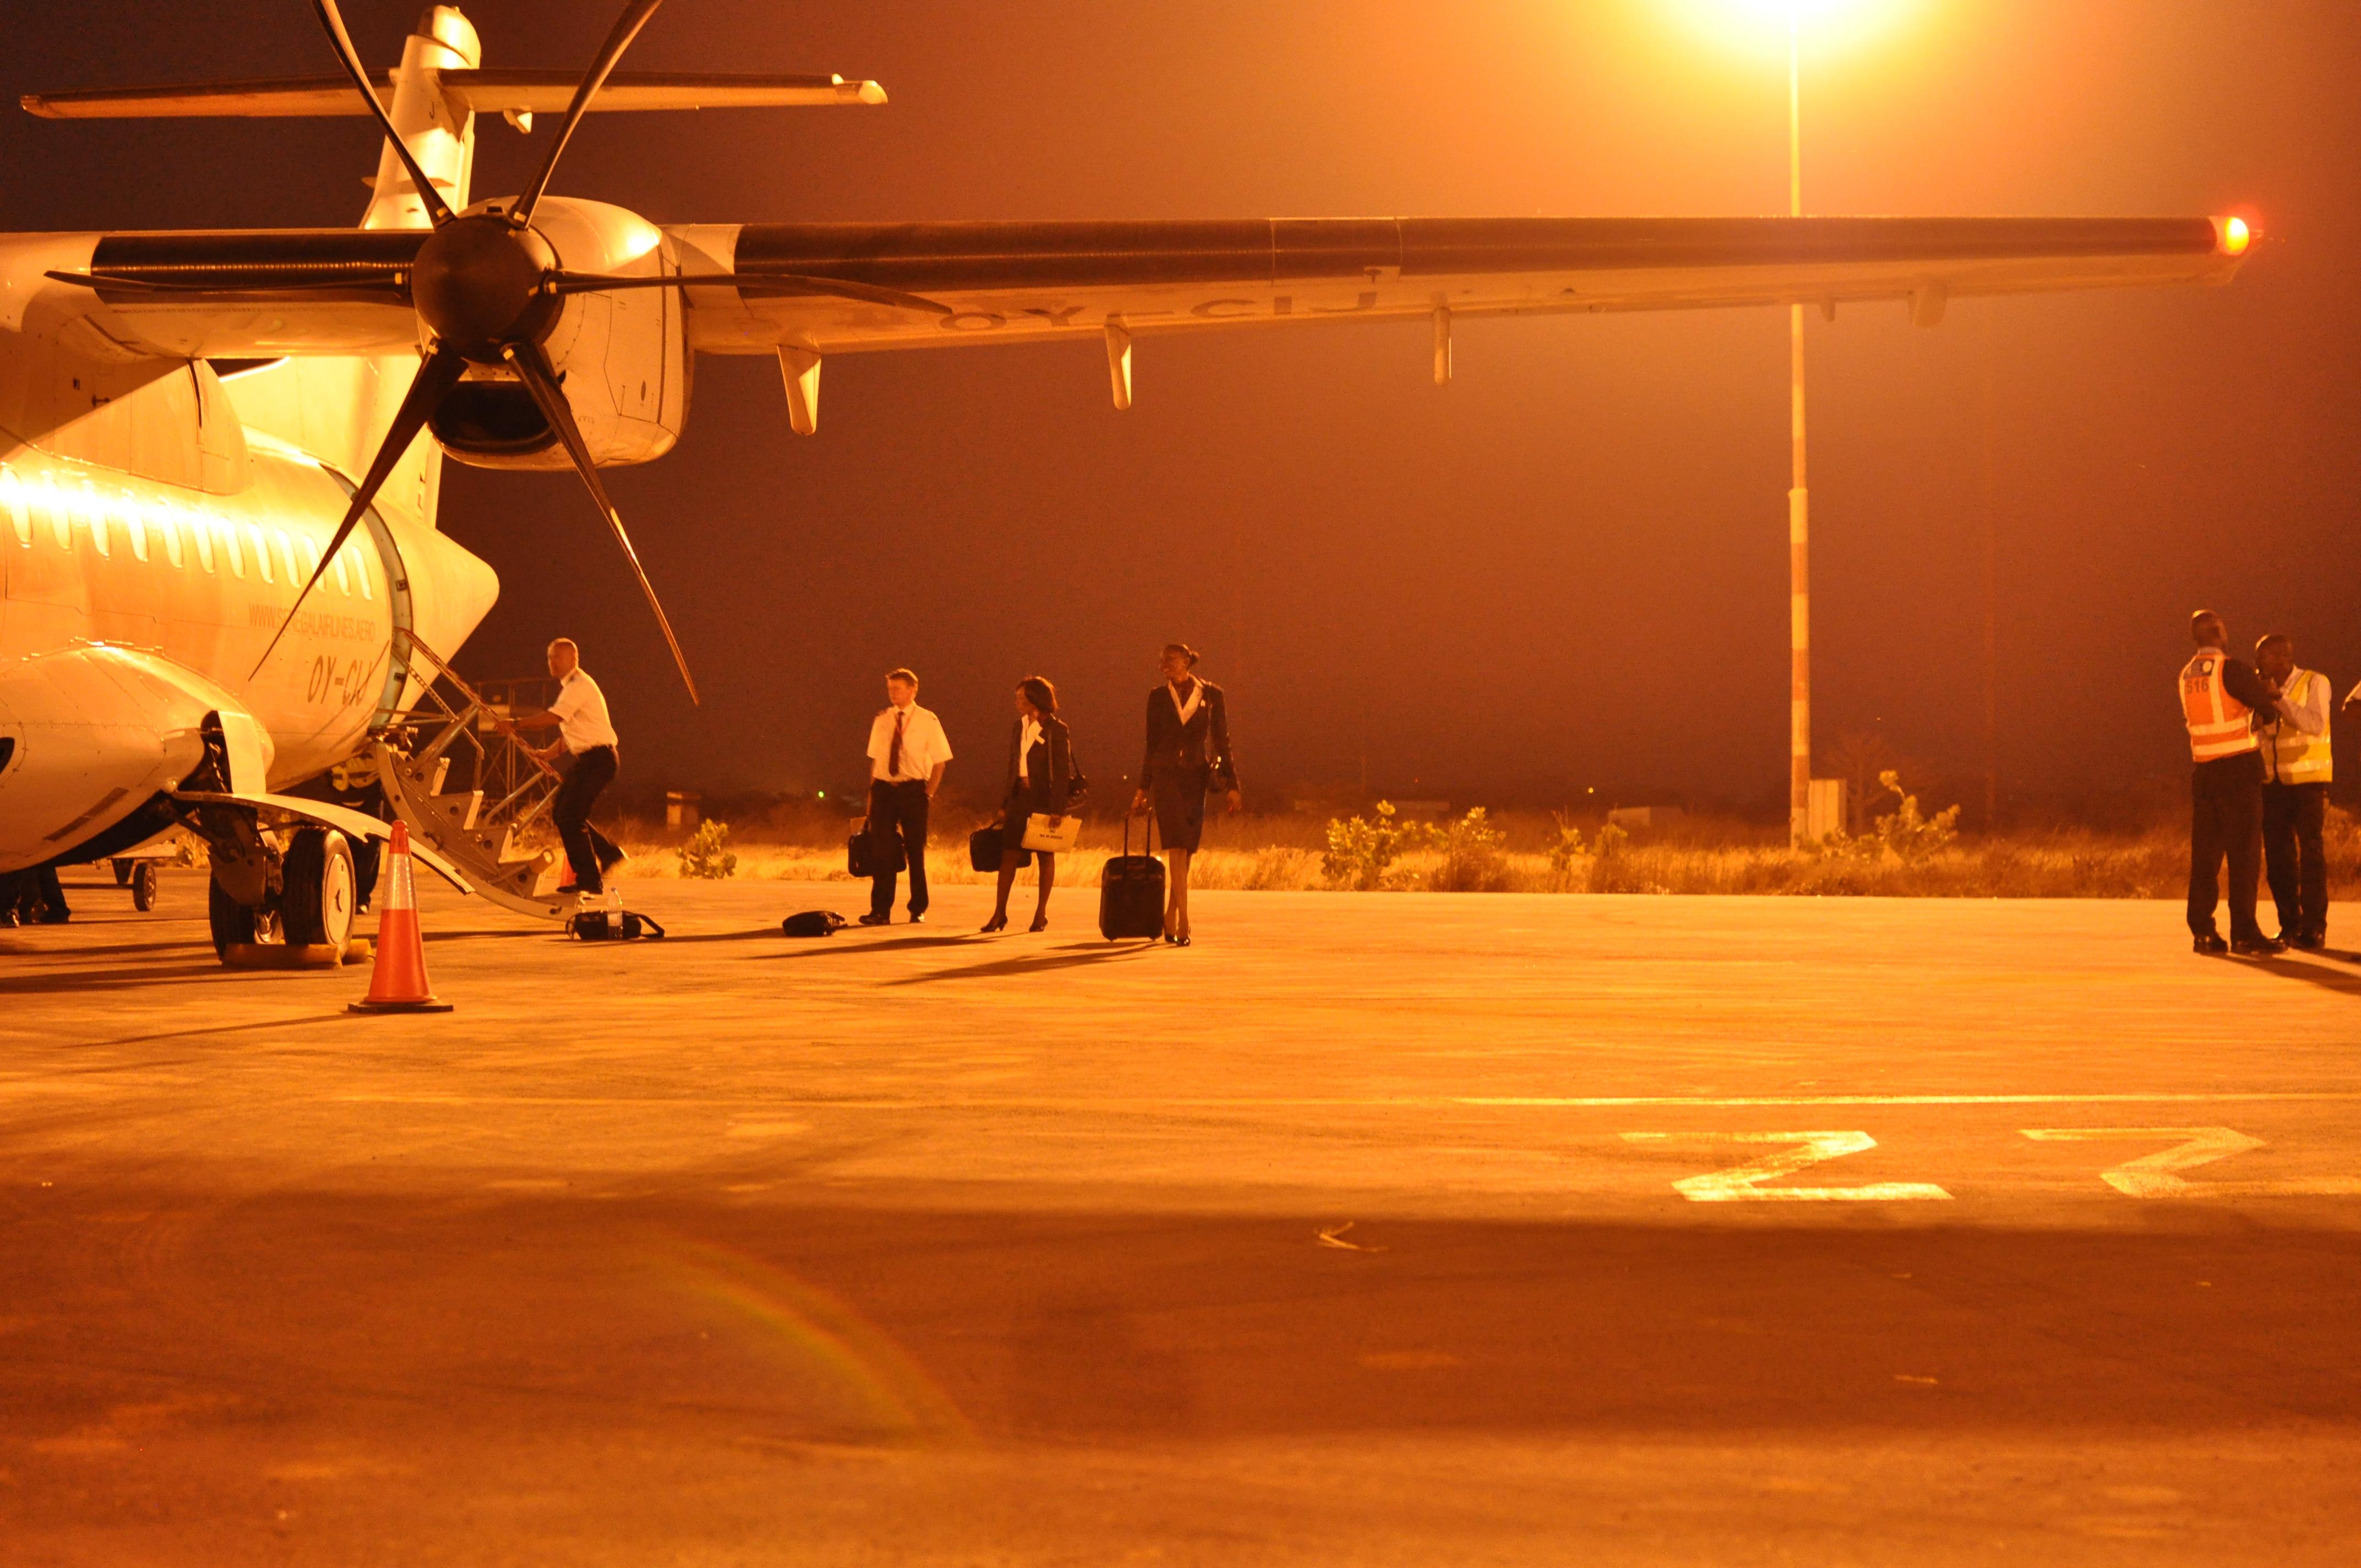 ATR Operator Support